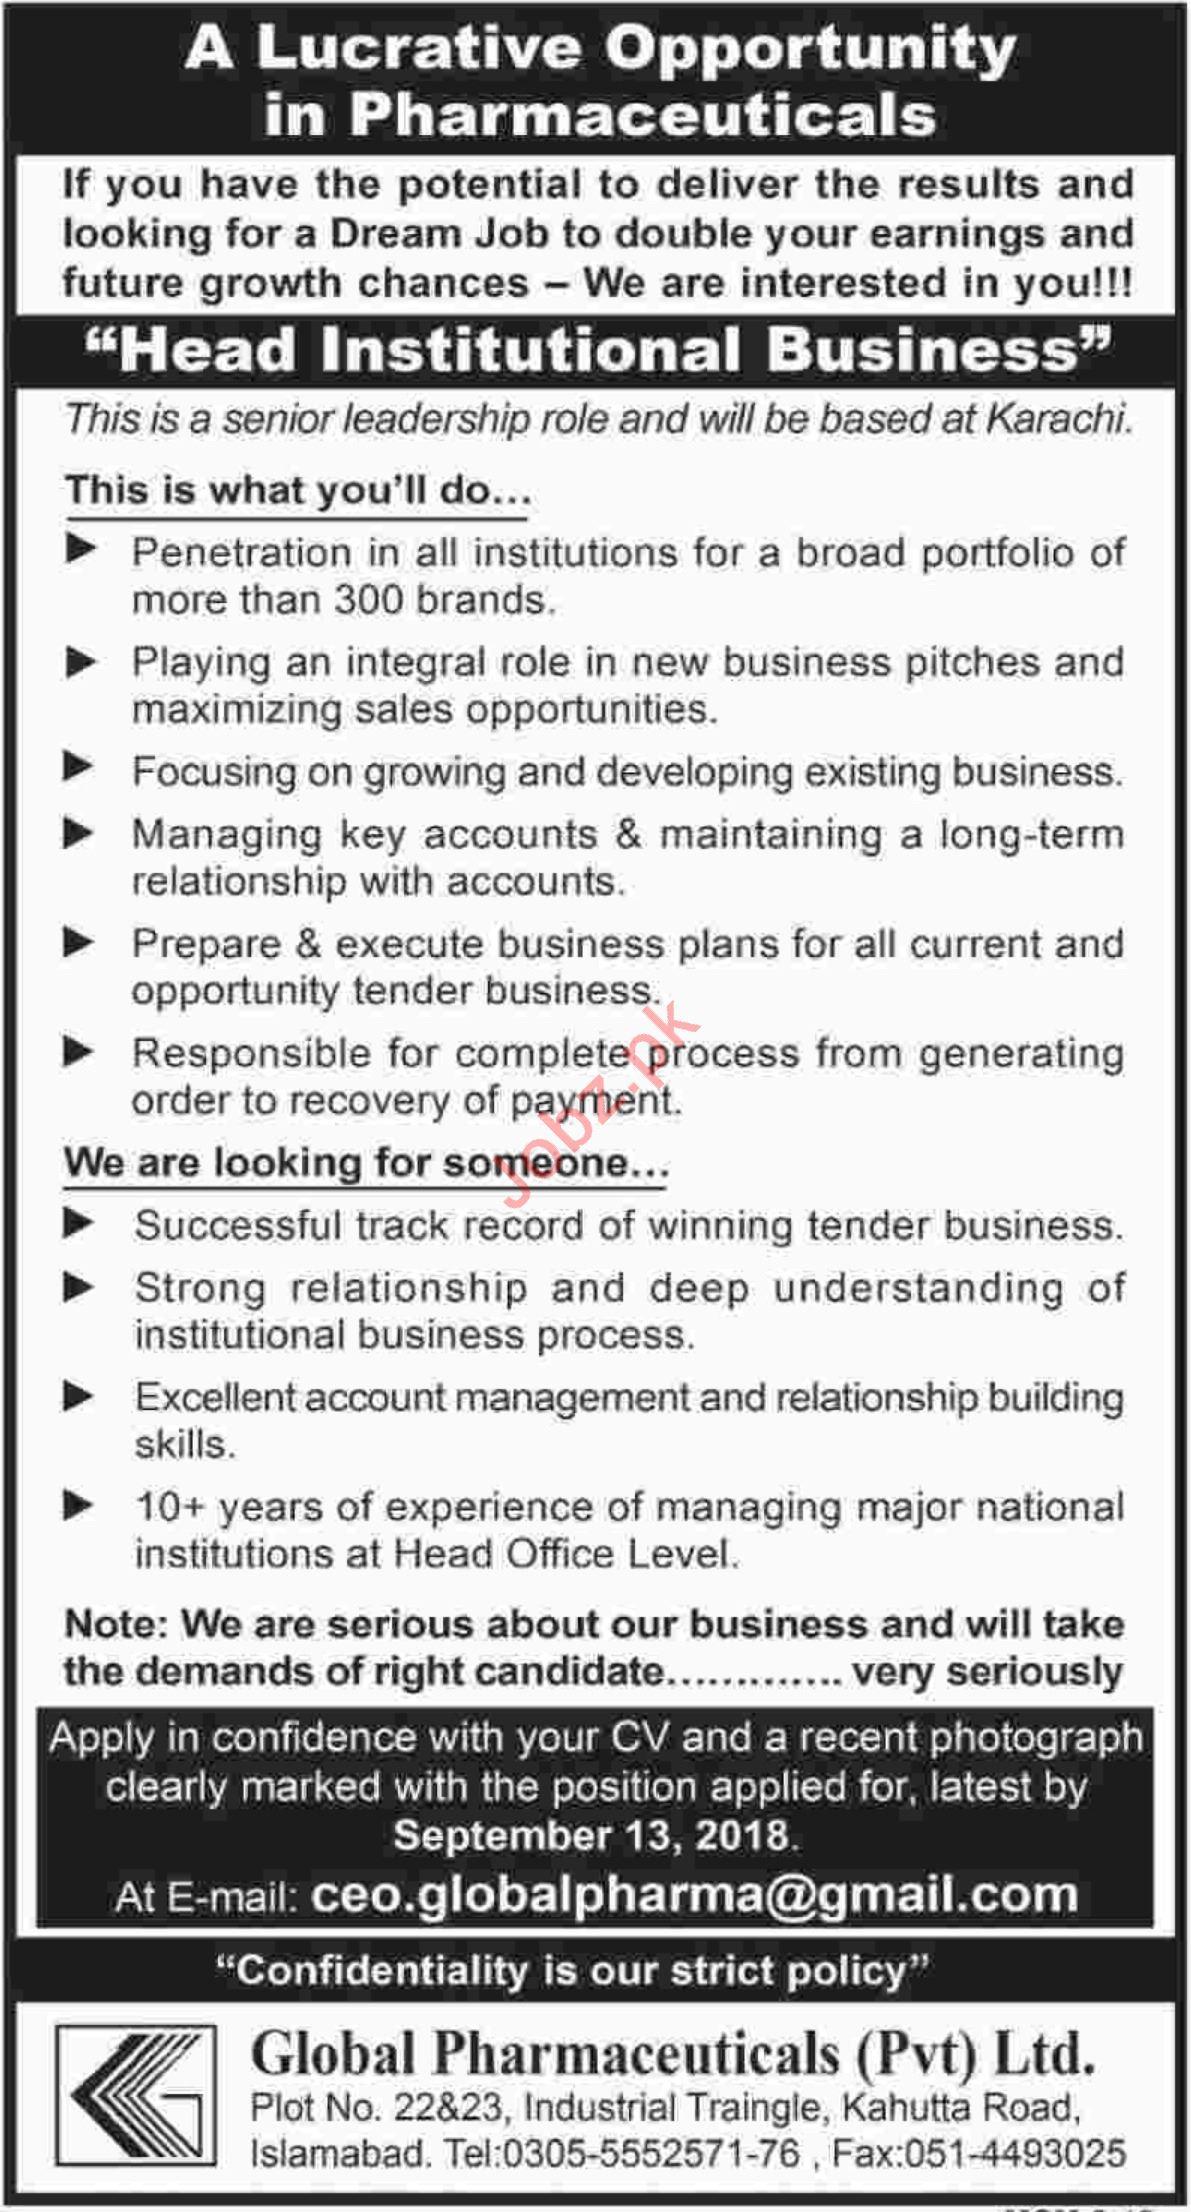 Jobs at Global Pharmaceuticals Pvt Ltd